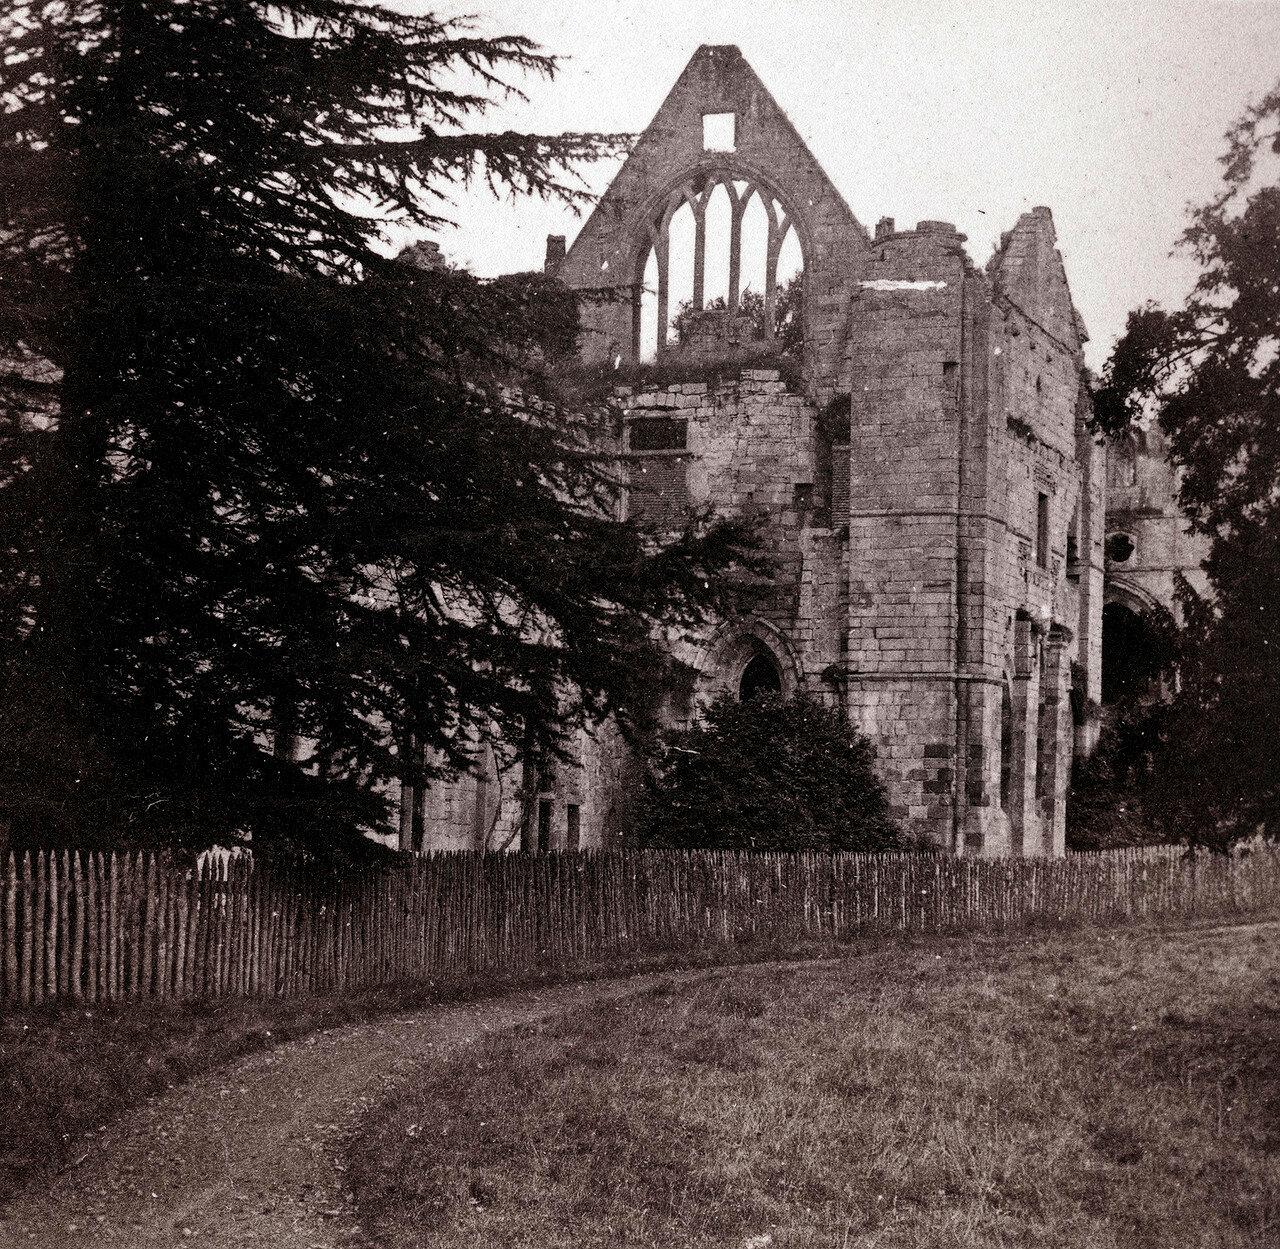 Аббатство Драйбург. Великобритания, 1864